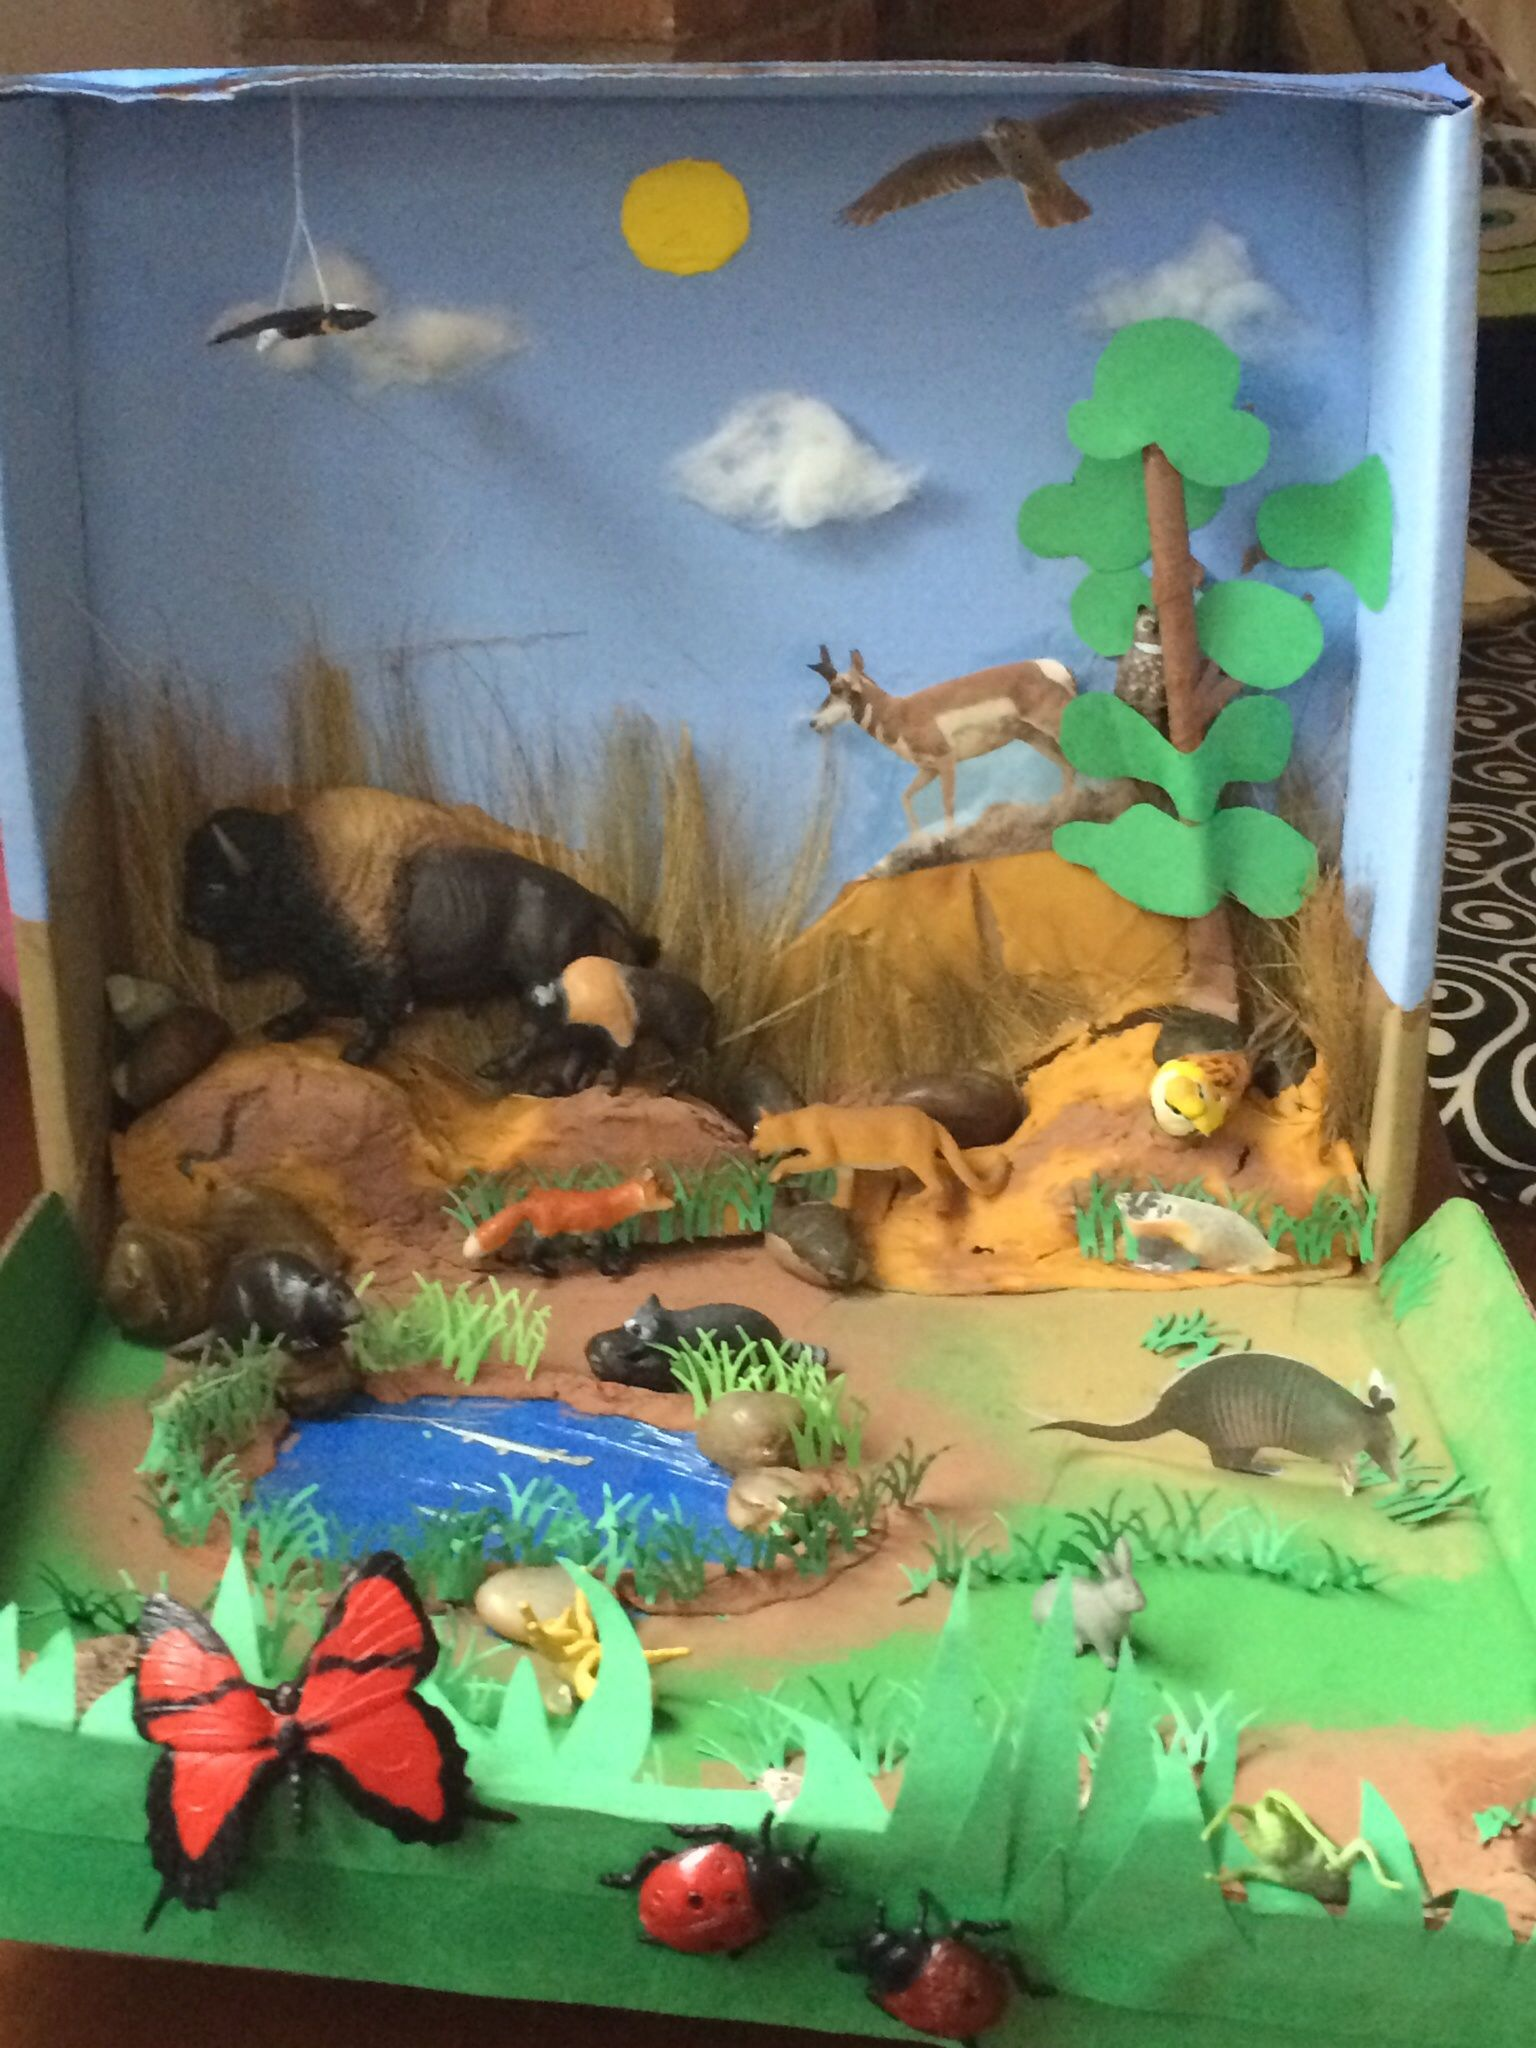 Biome Diorama Grasslands